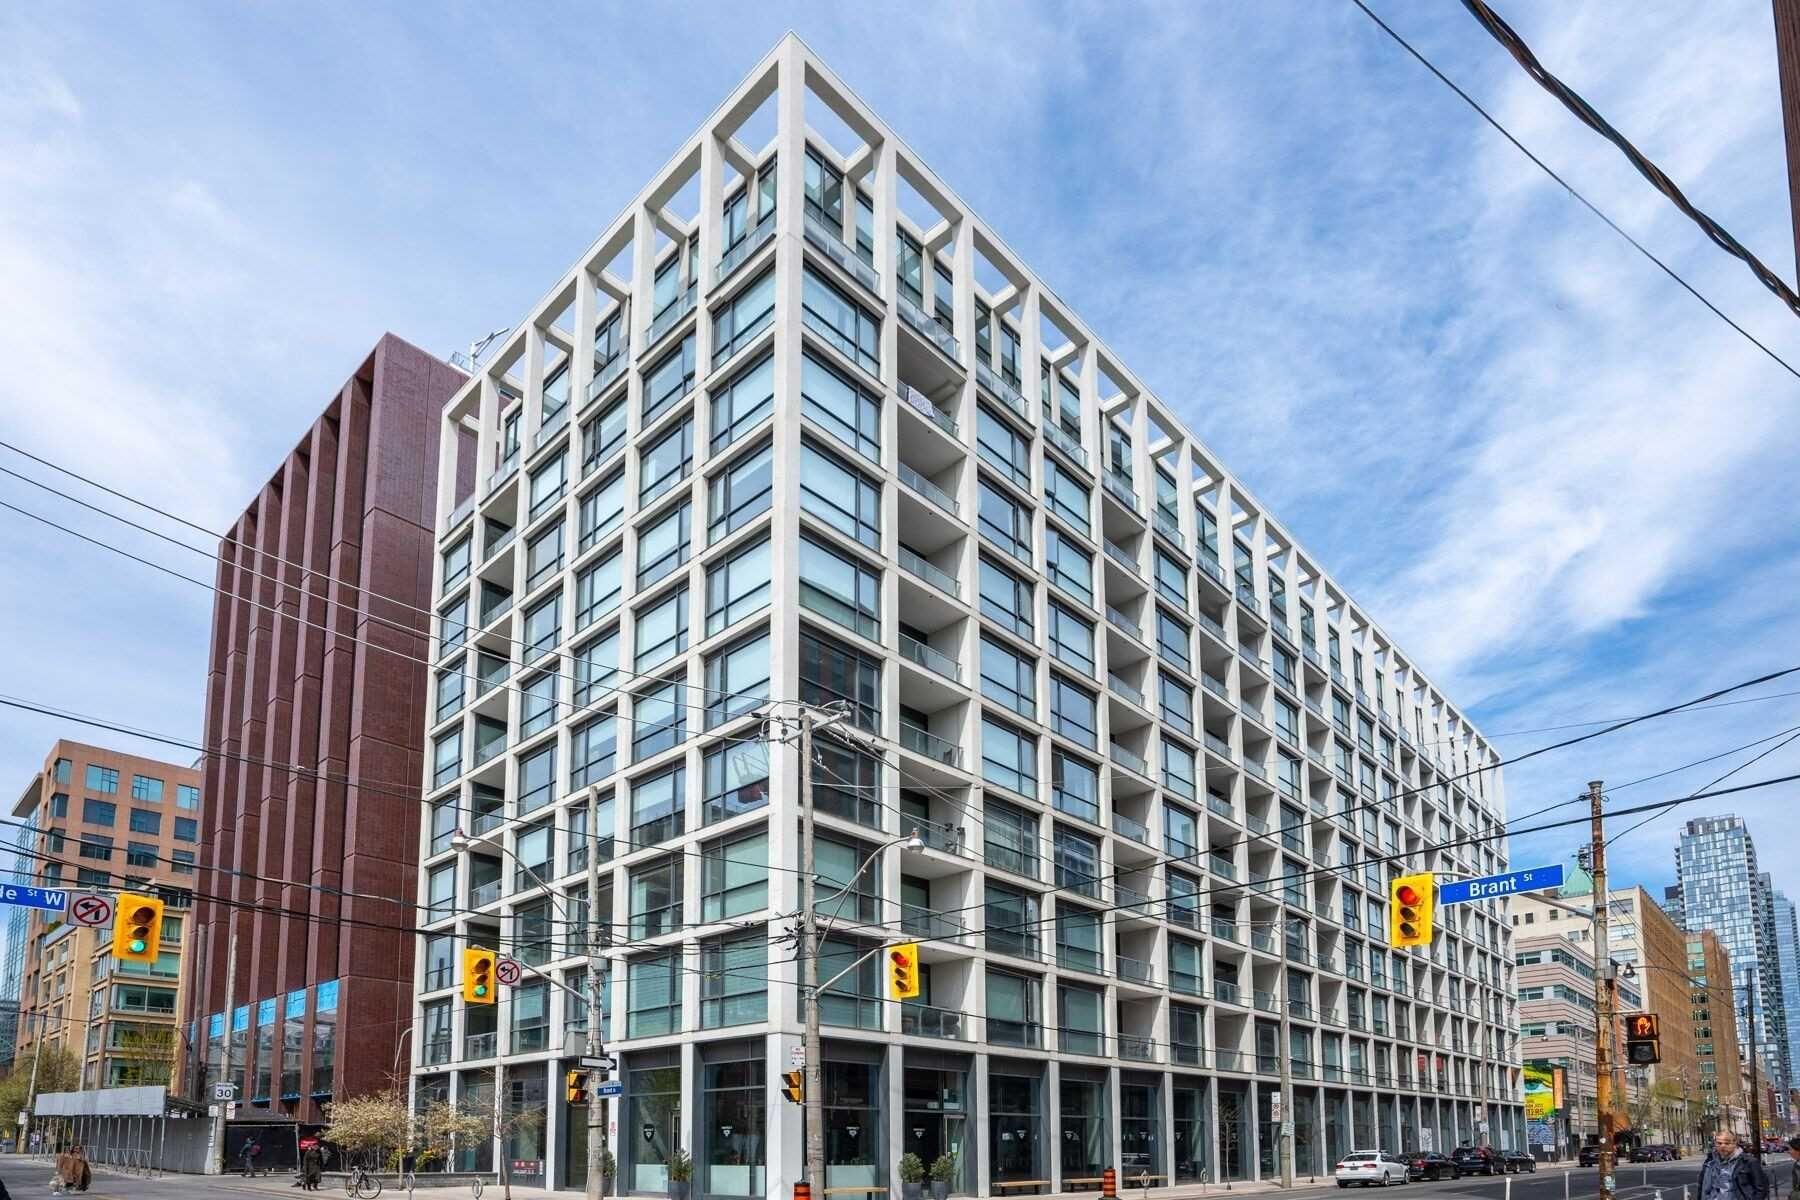 Main Photo: 1013 39 Brant Street in Toronto: Waterfront Communities C1 Condo for sale (Toronto C01)  : MLS®# C4758613